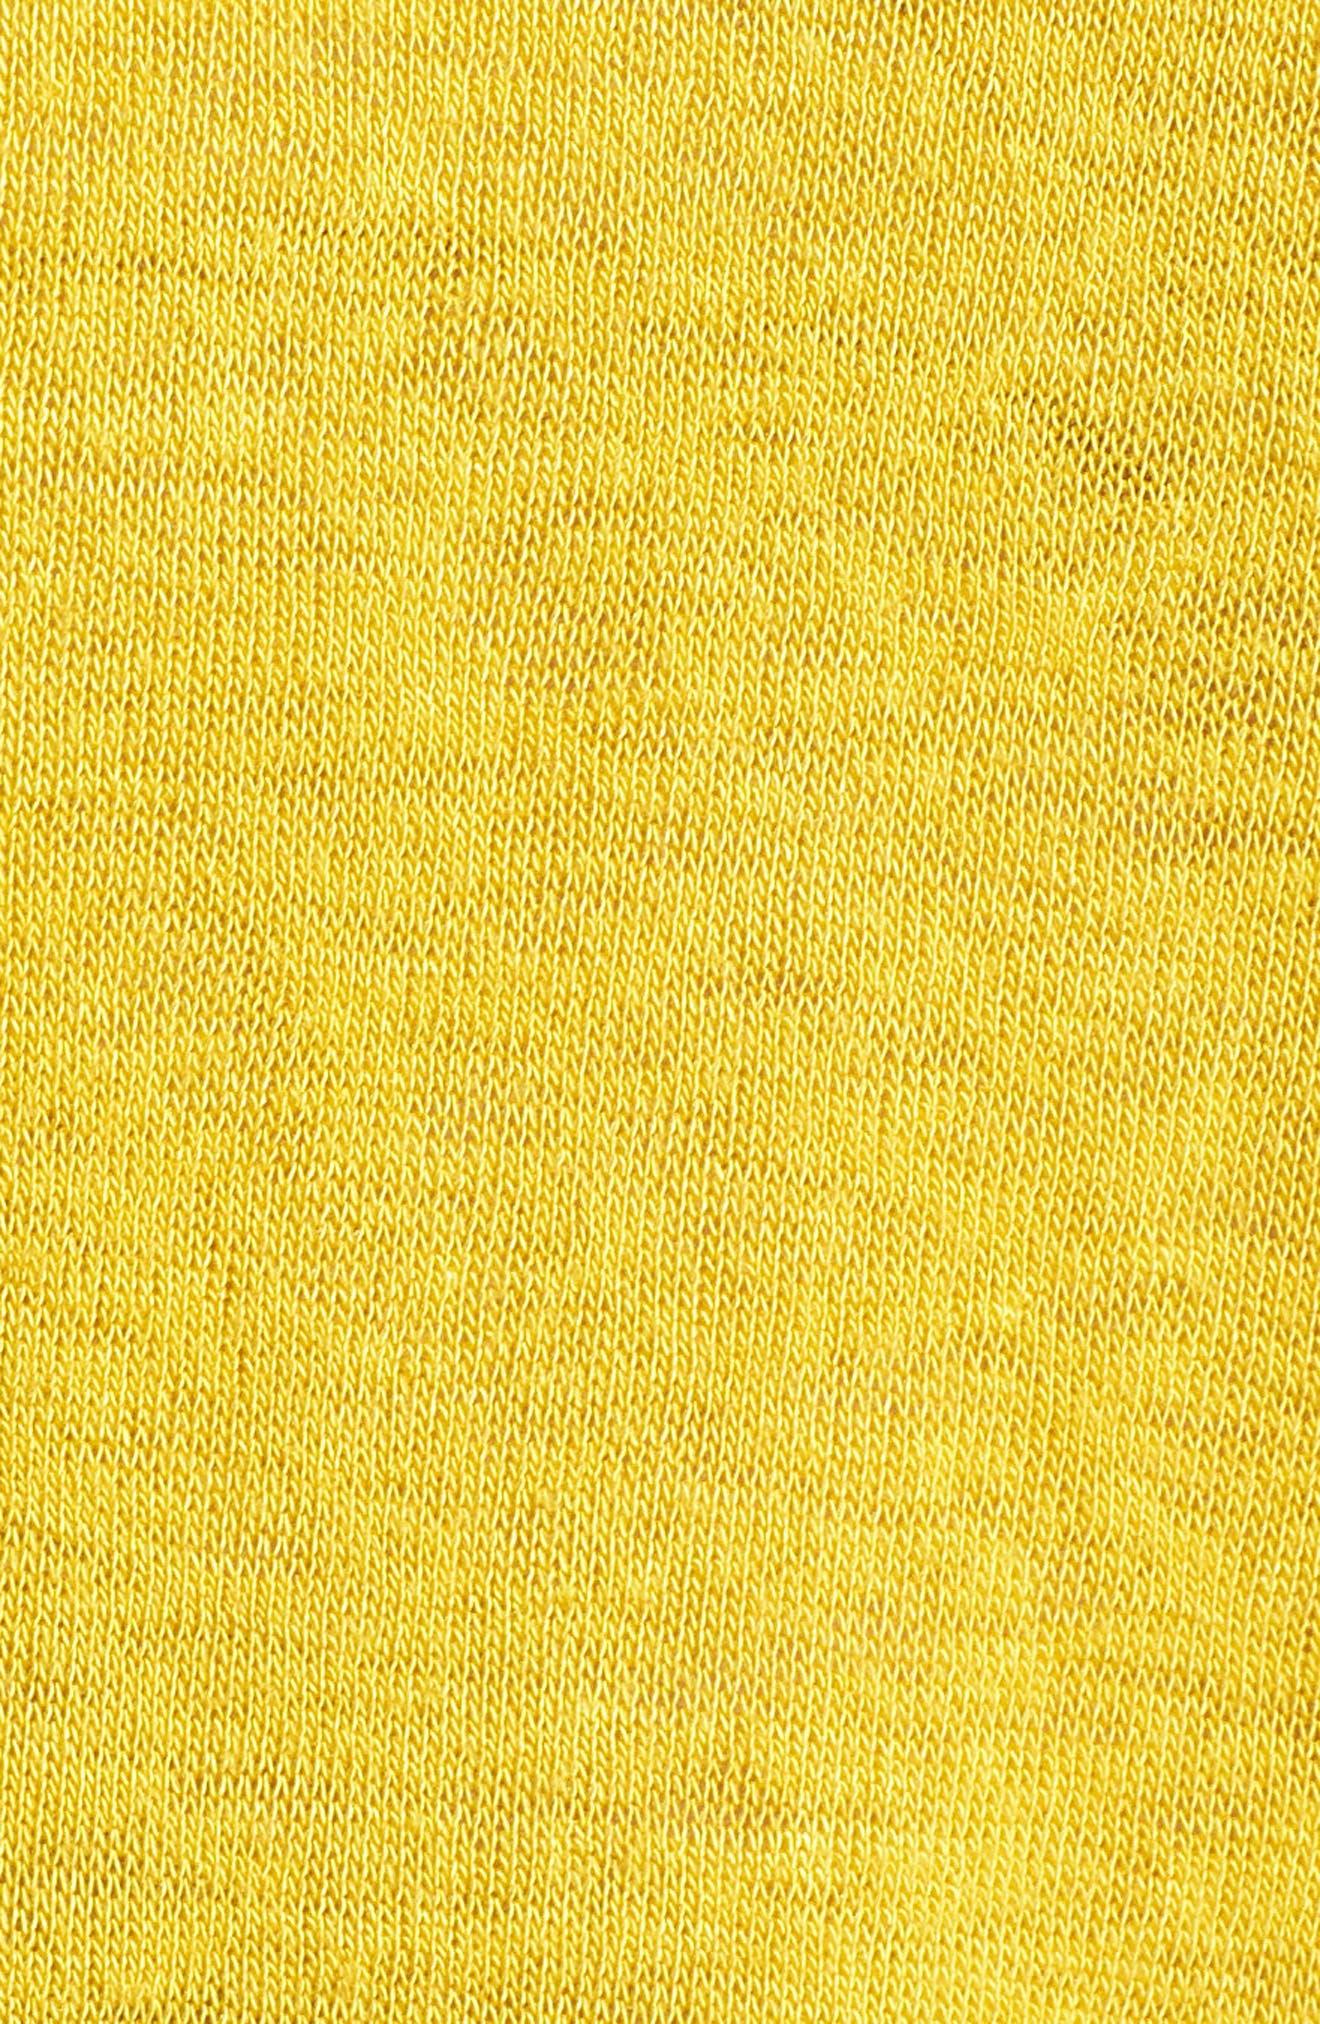 Tuck Sleeve Sweatshirt,                             Alternate thumbnail 5, color,                             Yellow Tea